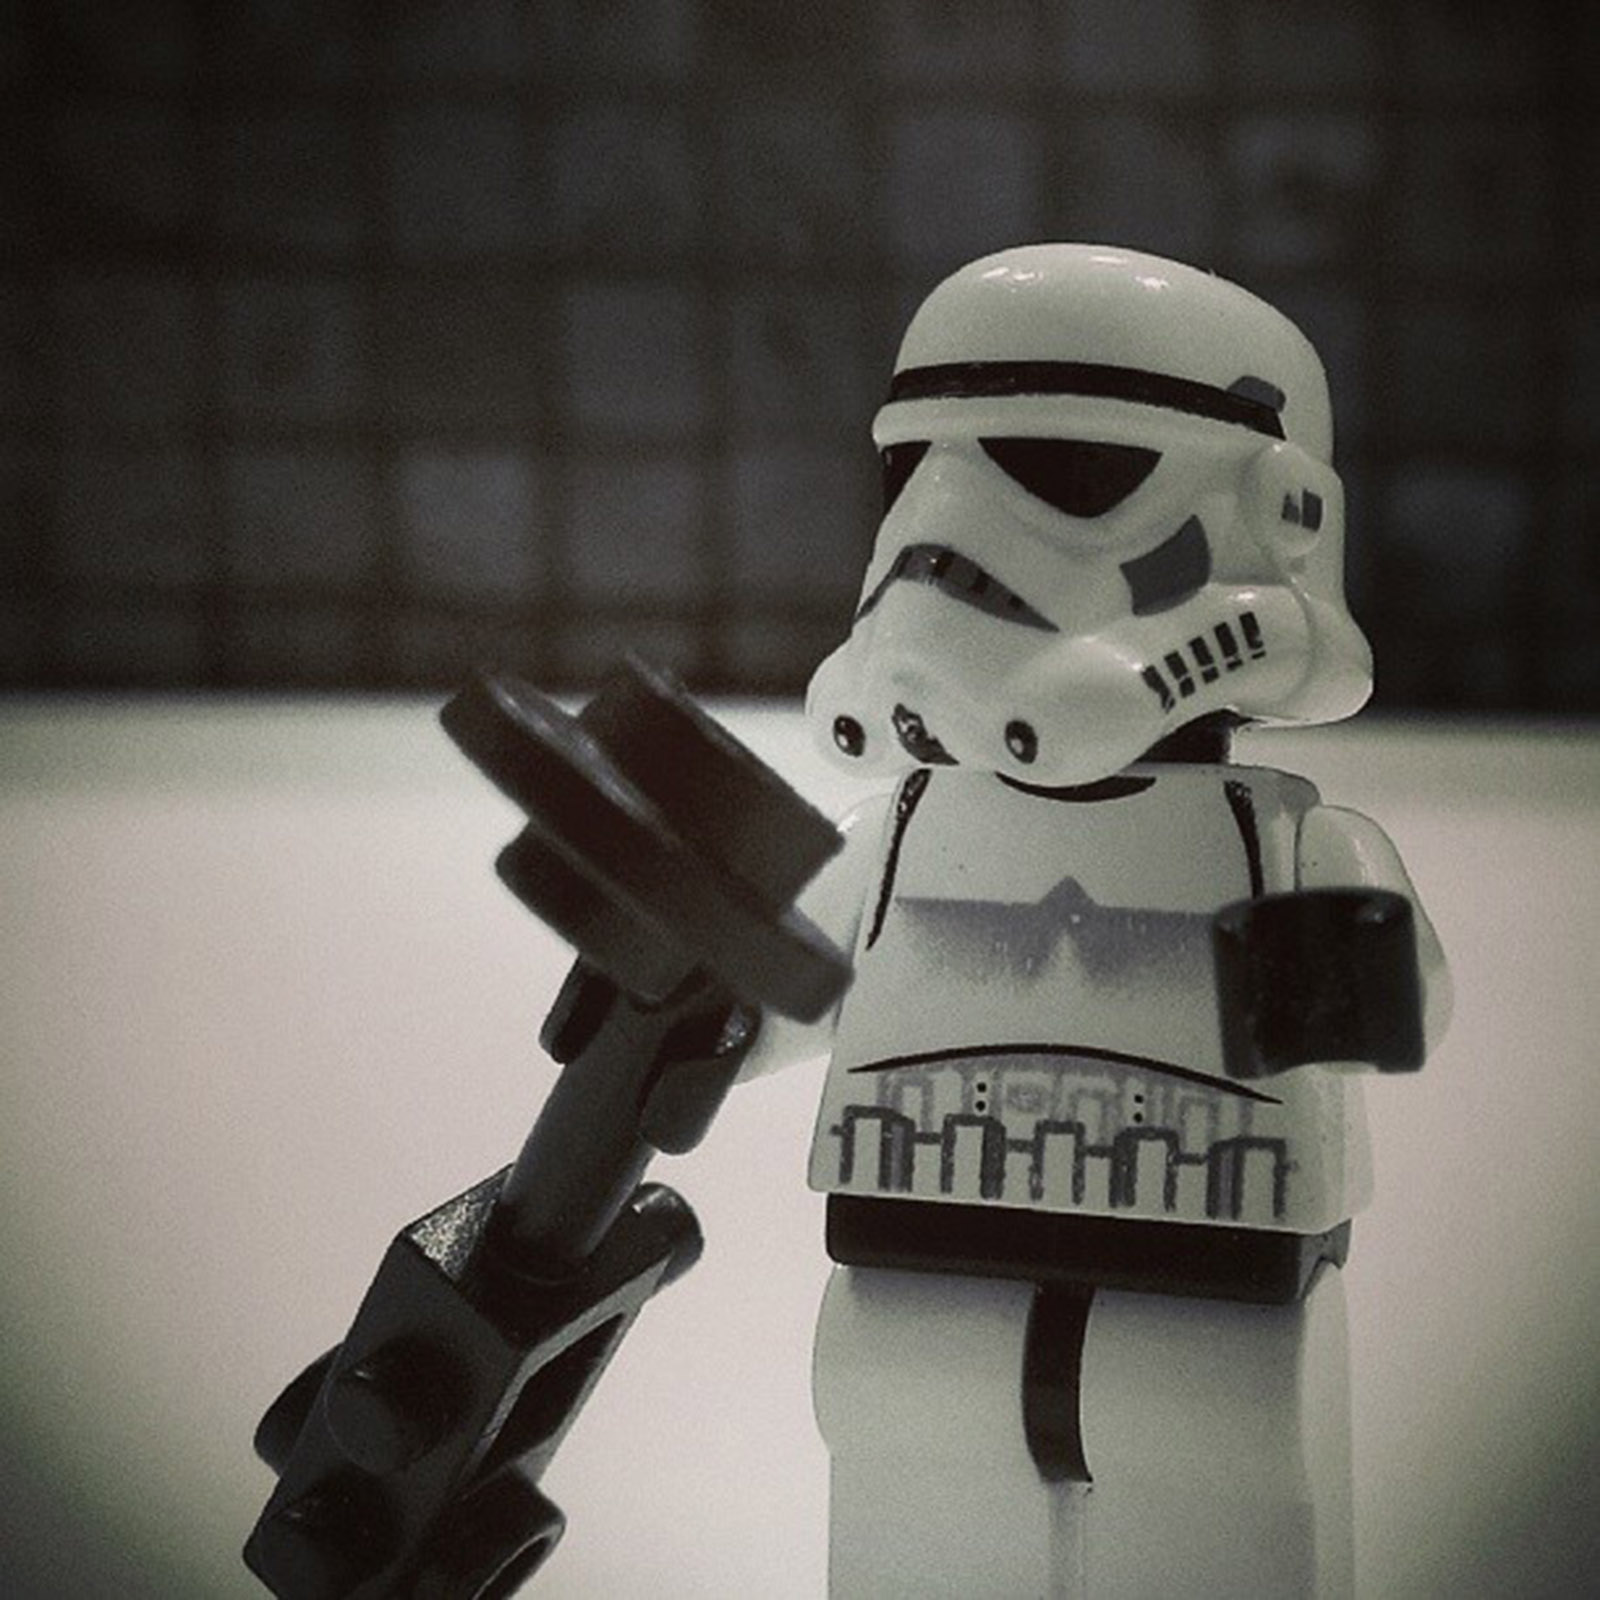 #thelonelytrooper-031.jpg